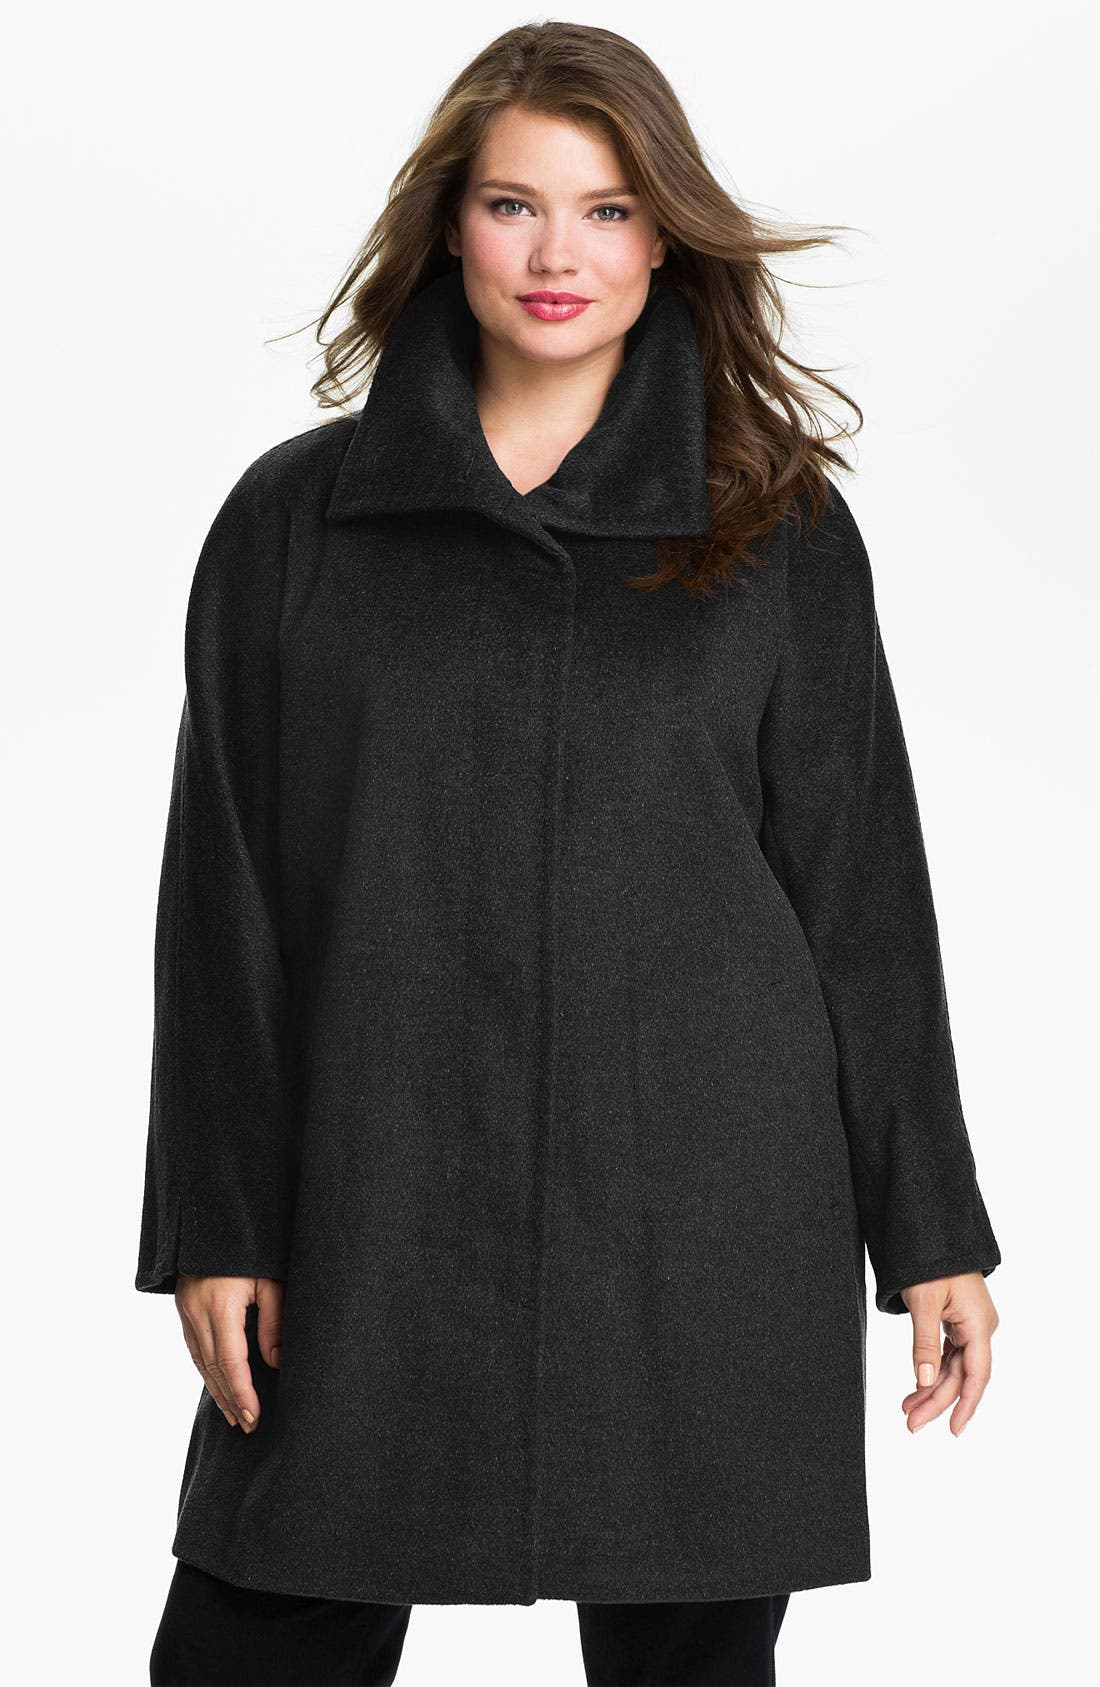 Alternate Image 1 Selected - Ellen Tracy Convertible Collar A-Line Coat (Plus) (Online Exclusive)